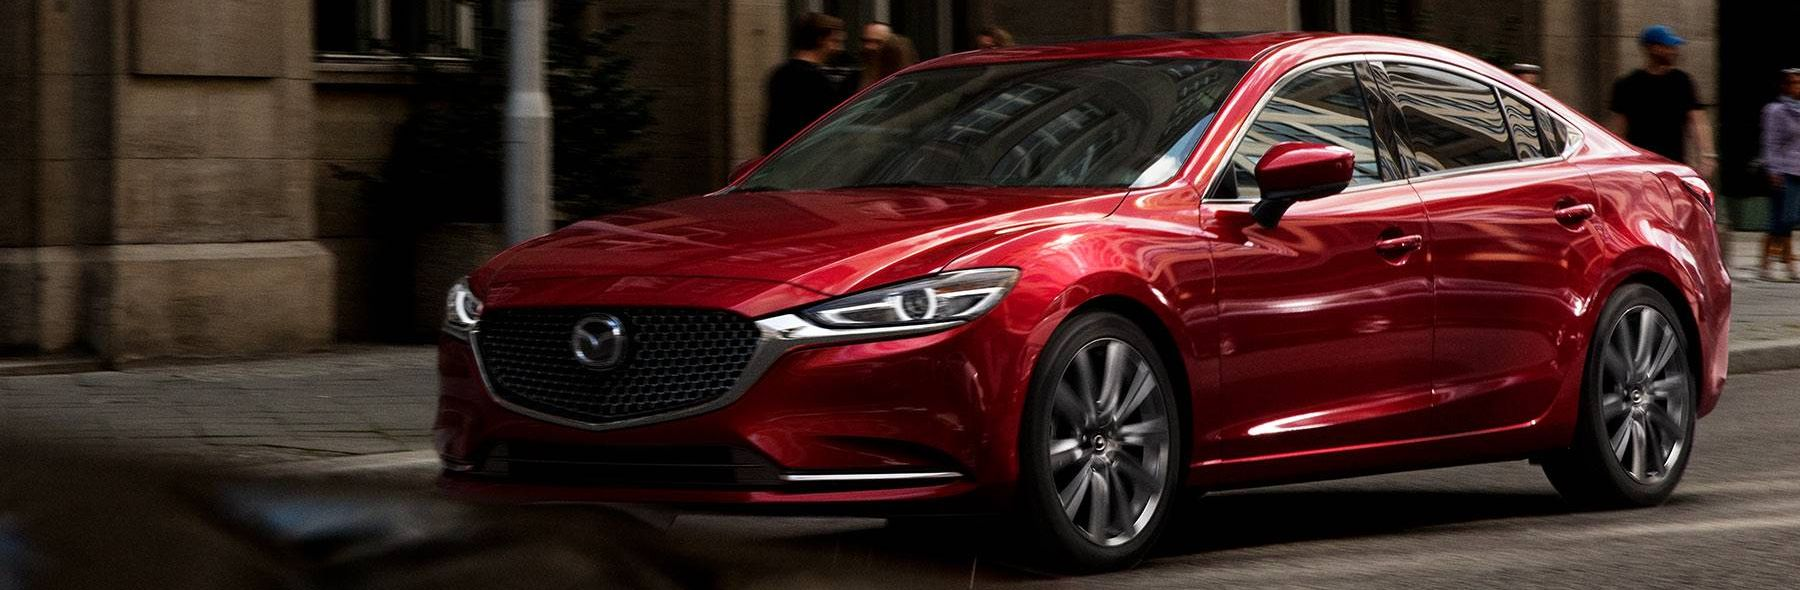 2018 Mazda6 for Sale near Austin, TX